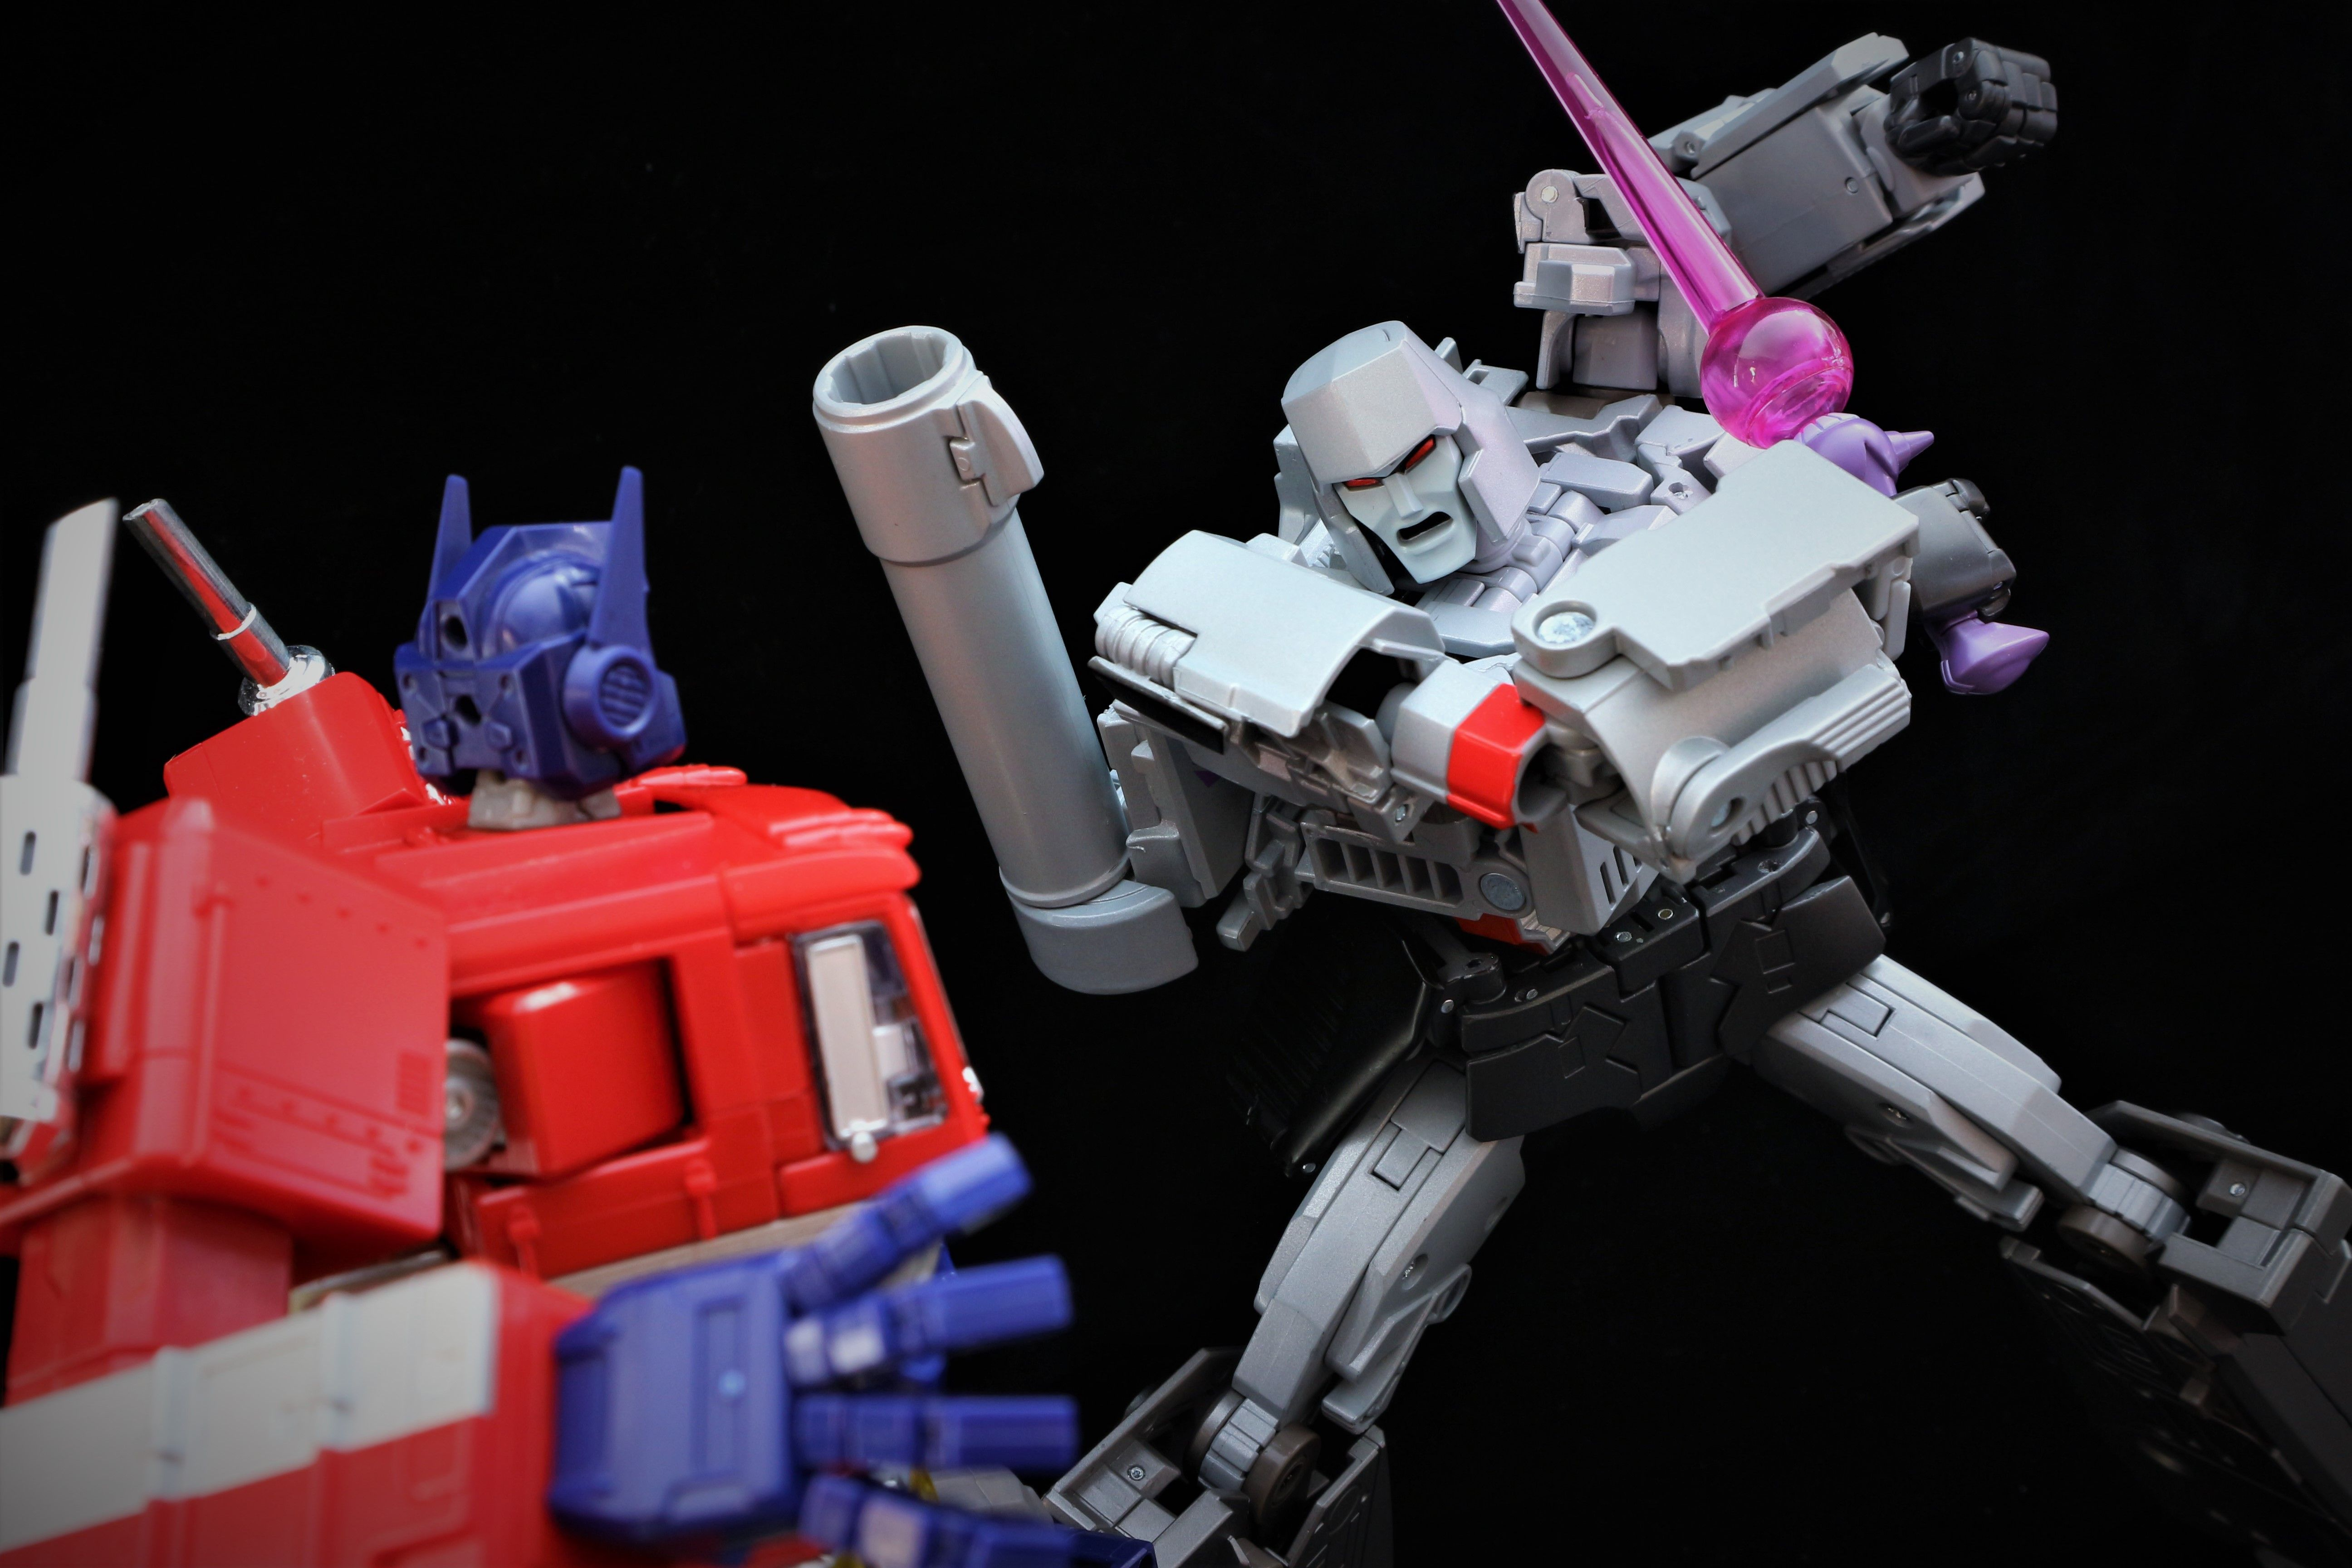 Transformers Masterpiece Mp 36 Megatron With 10 Convoy Optimus Prime